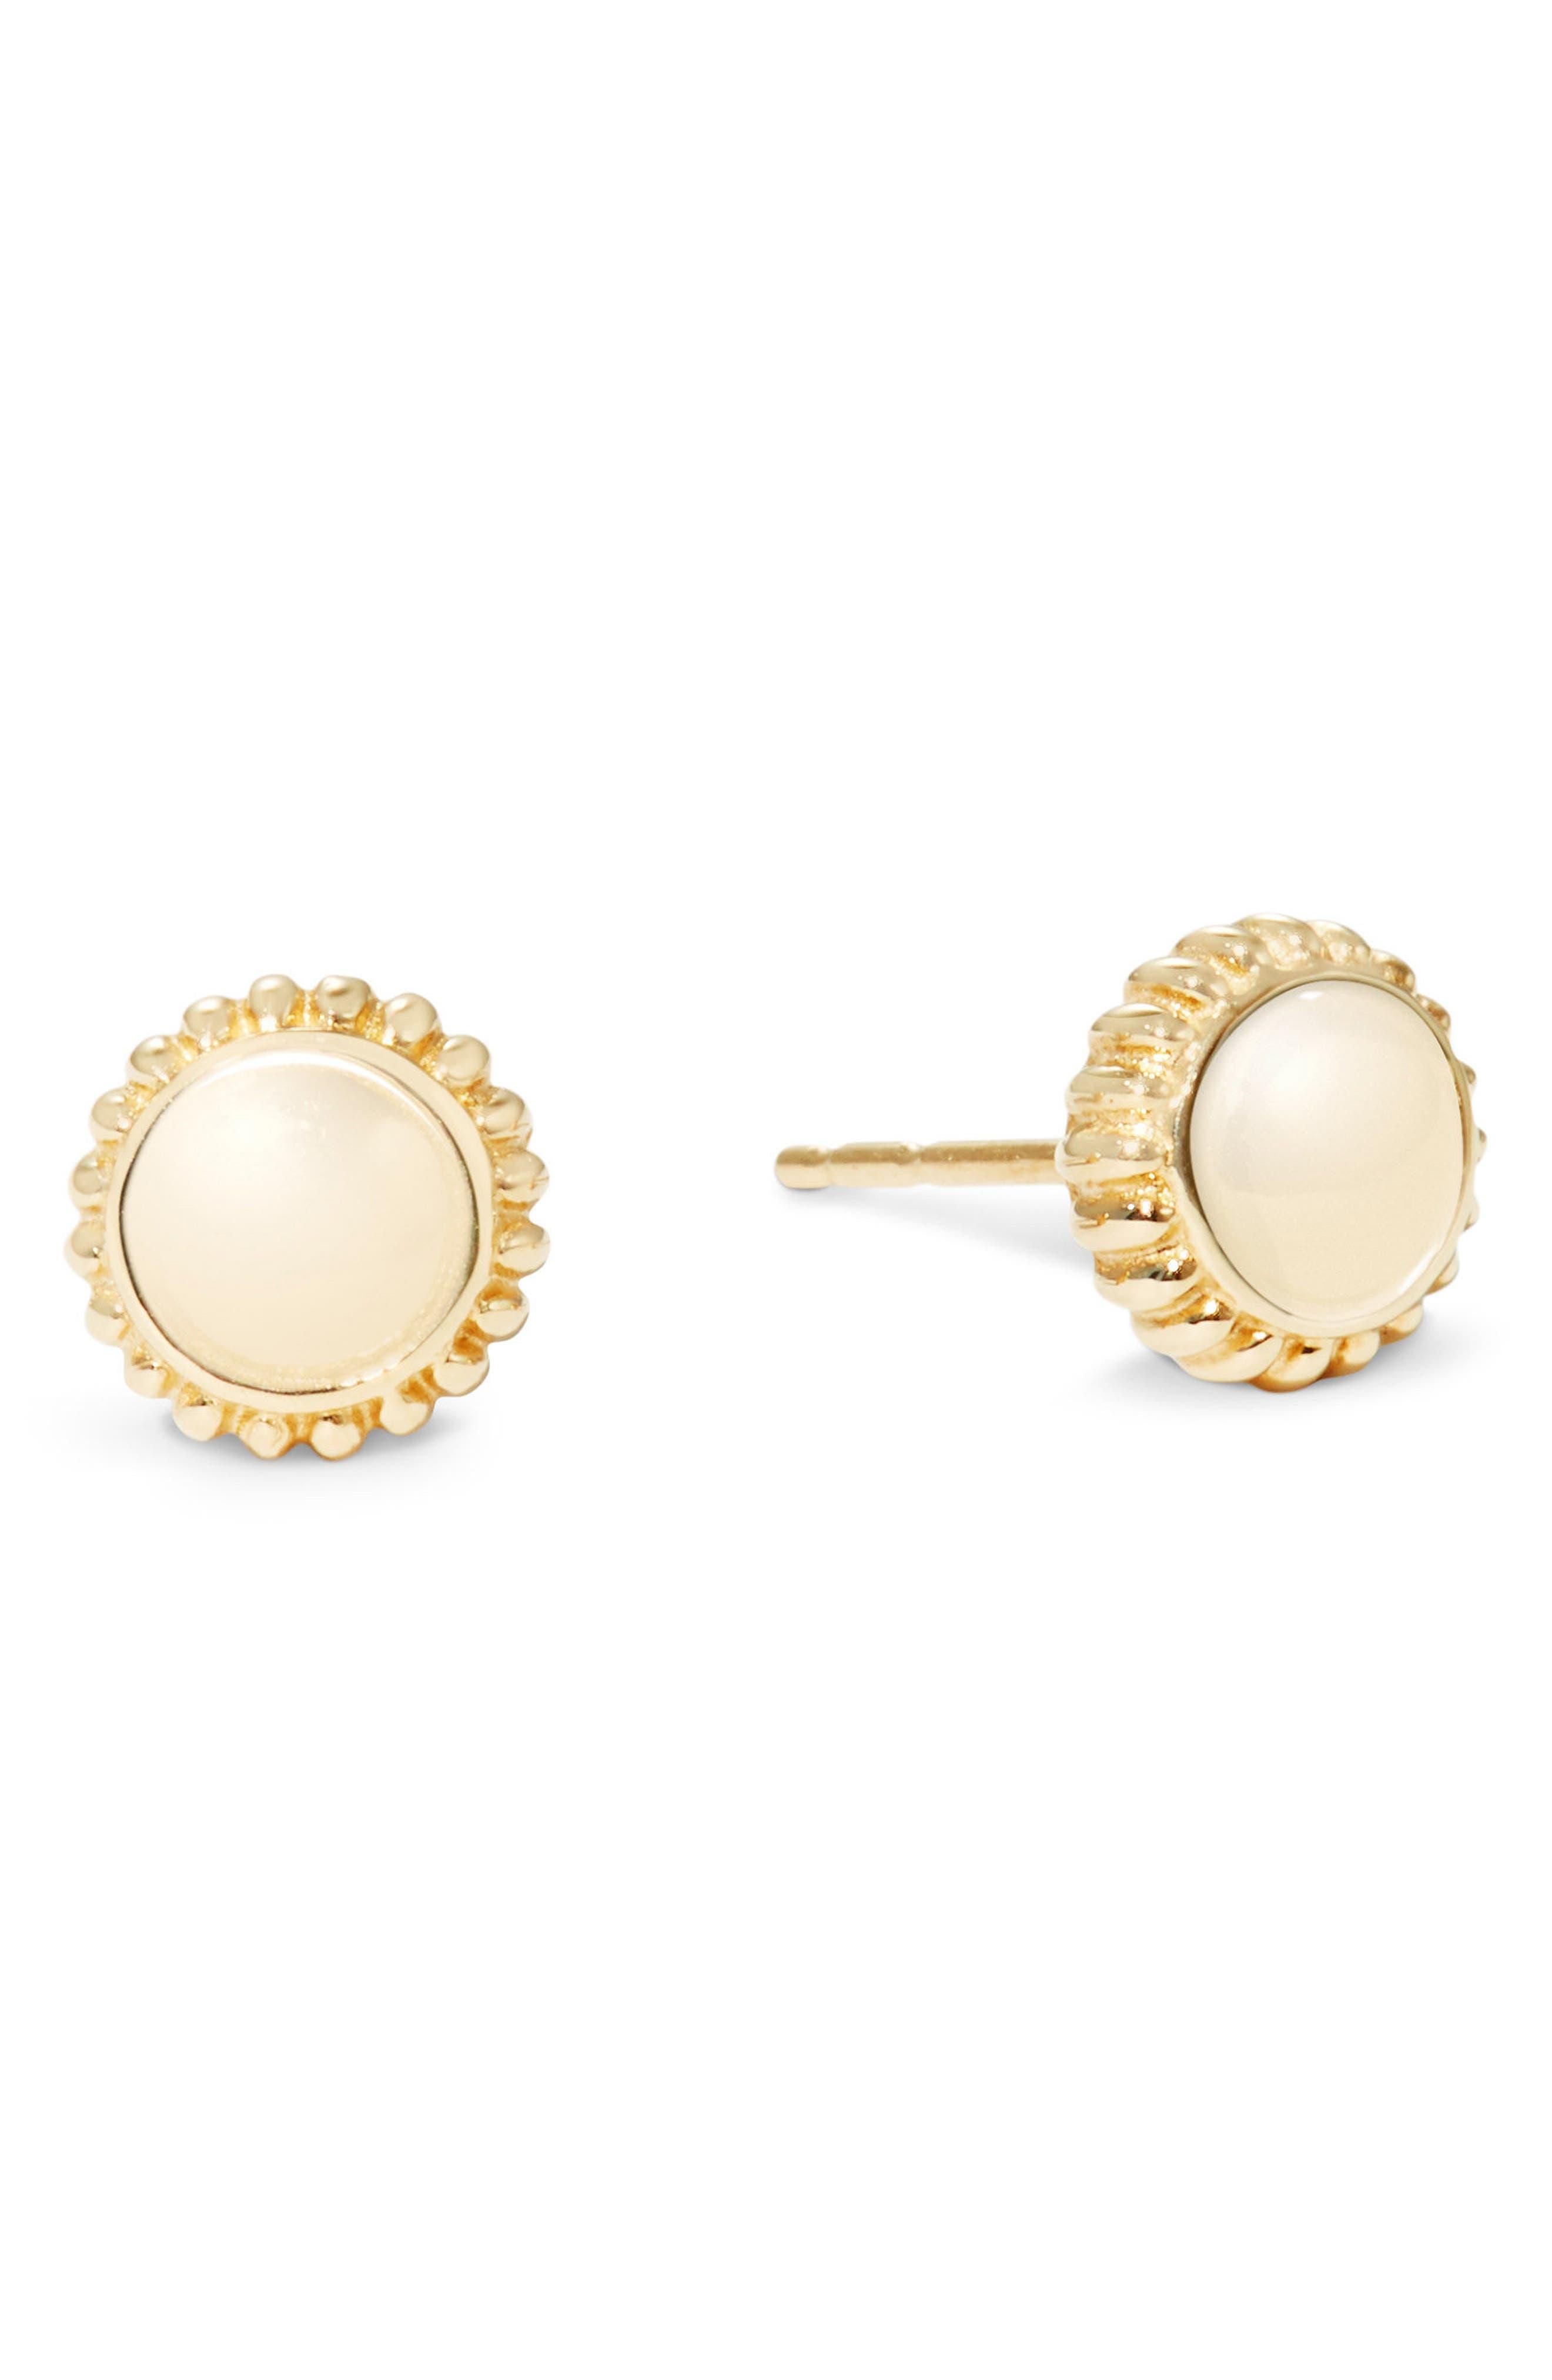 Shinola Coin Edge Stud Earrings